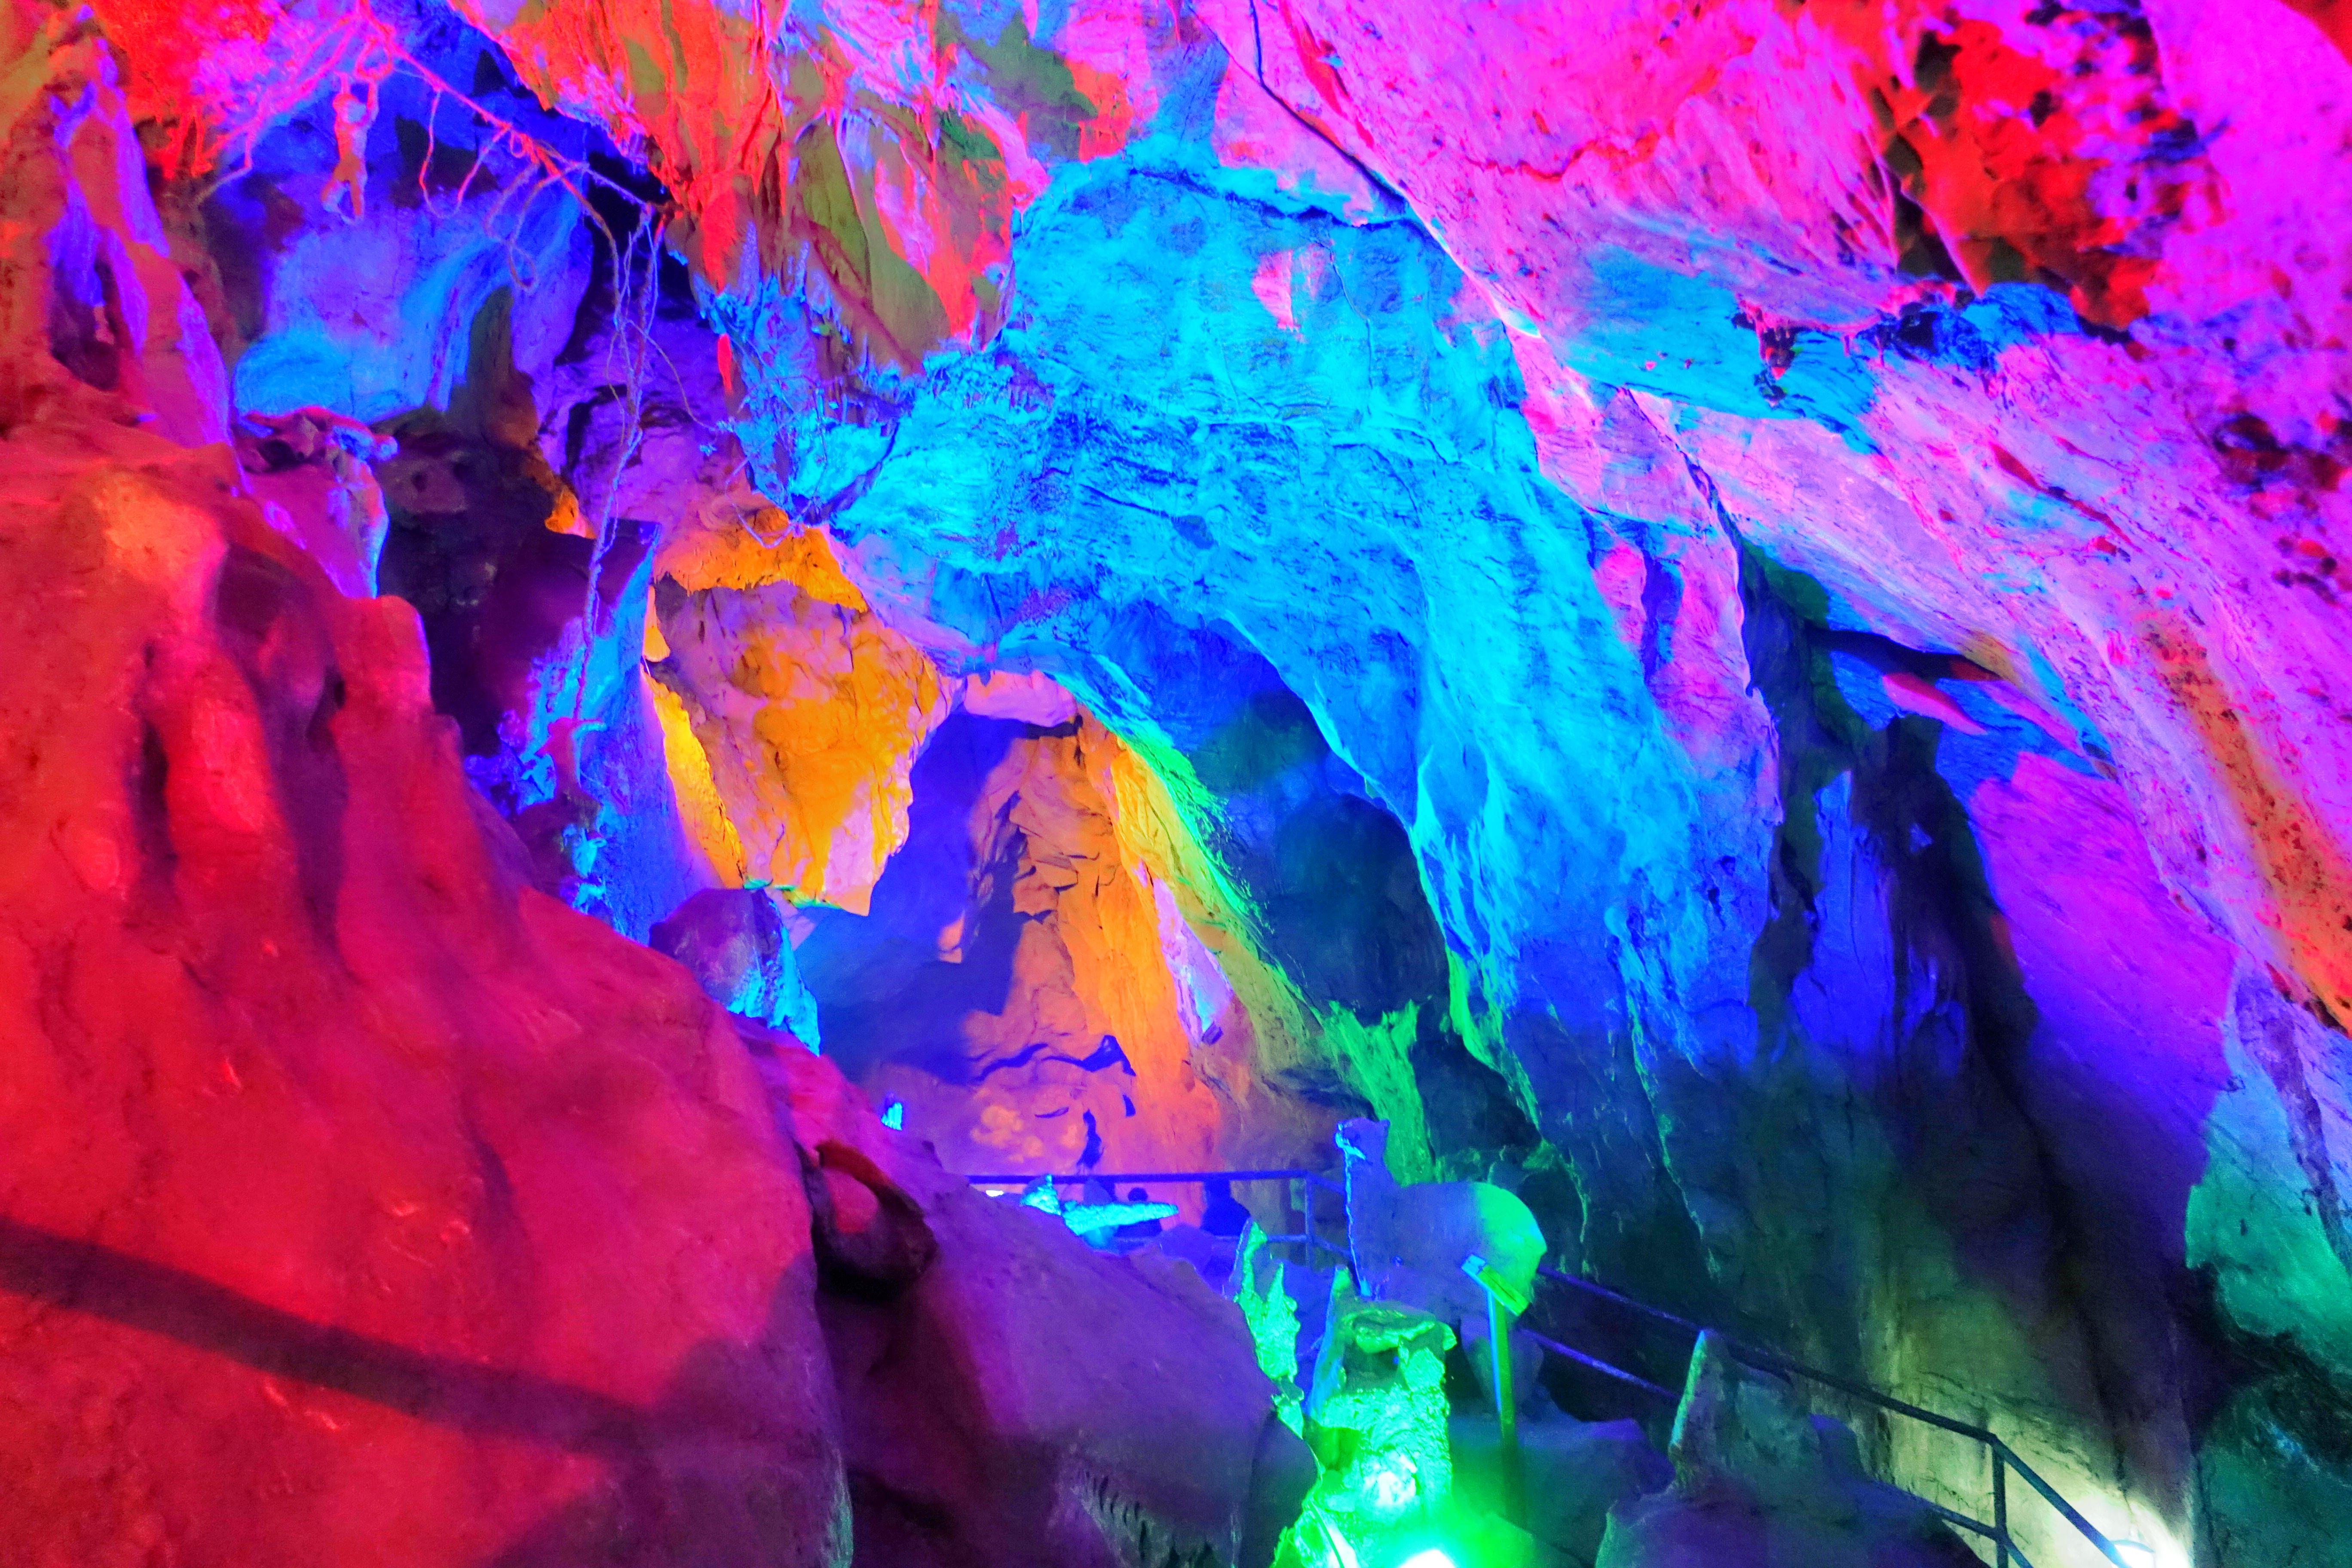 Tai'an Underground Dragon Palace (Formerly Taishan Rift Valley)